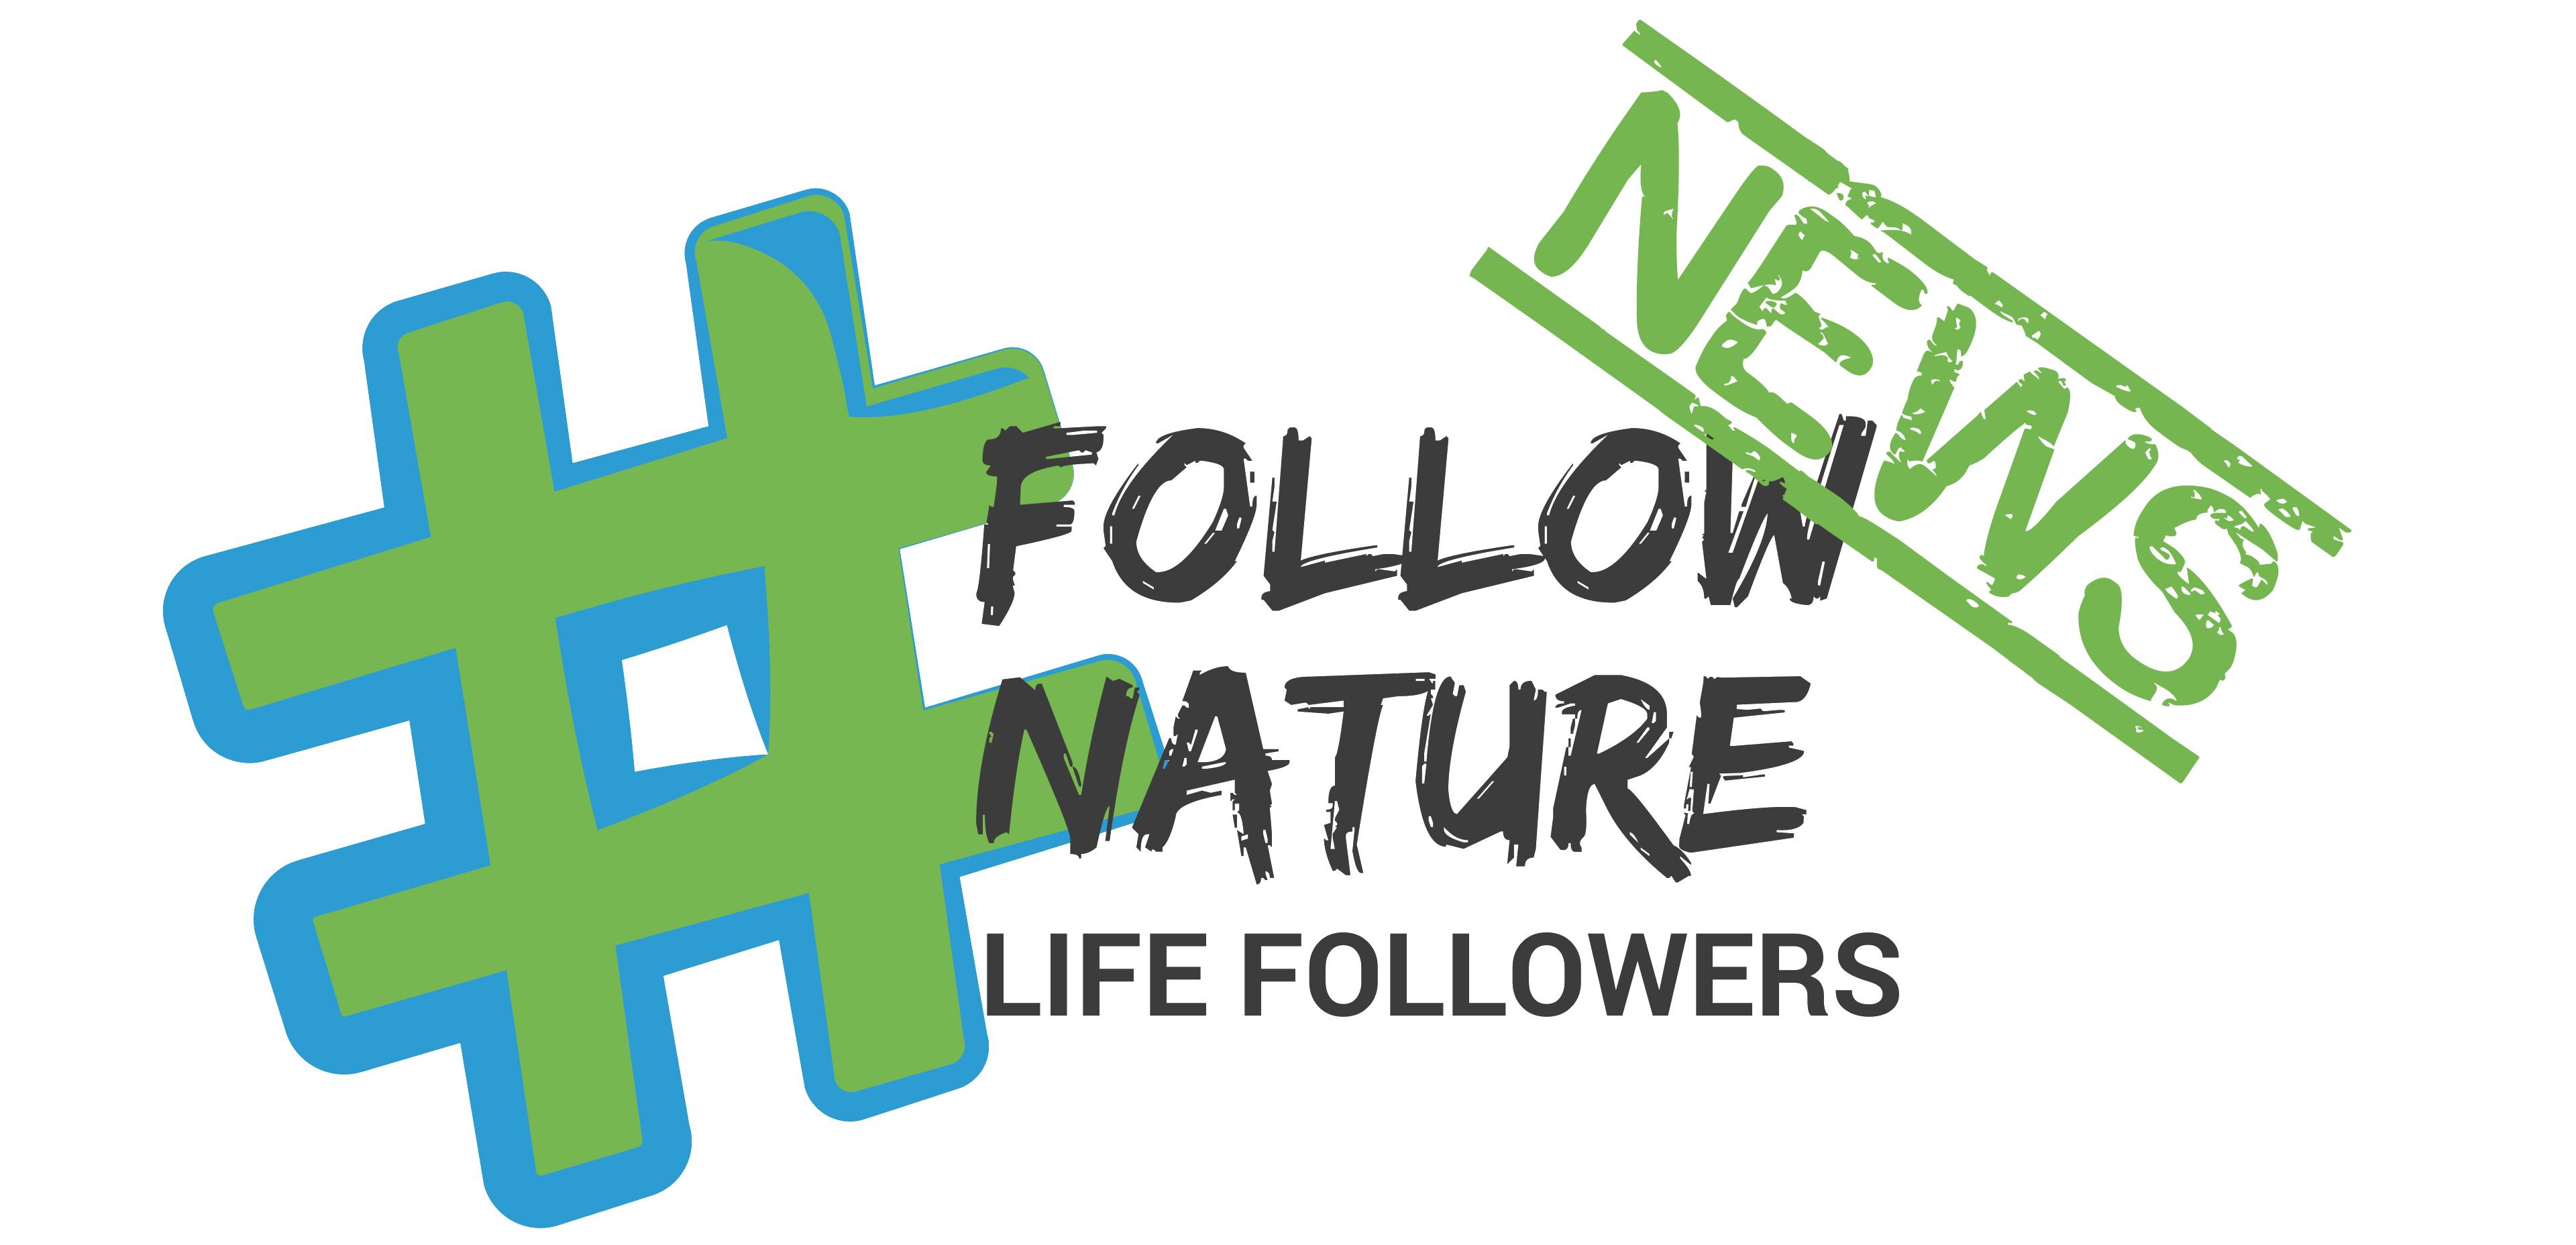 #FollowersNews: Noticiario mensual (Julio 2019)